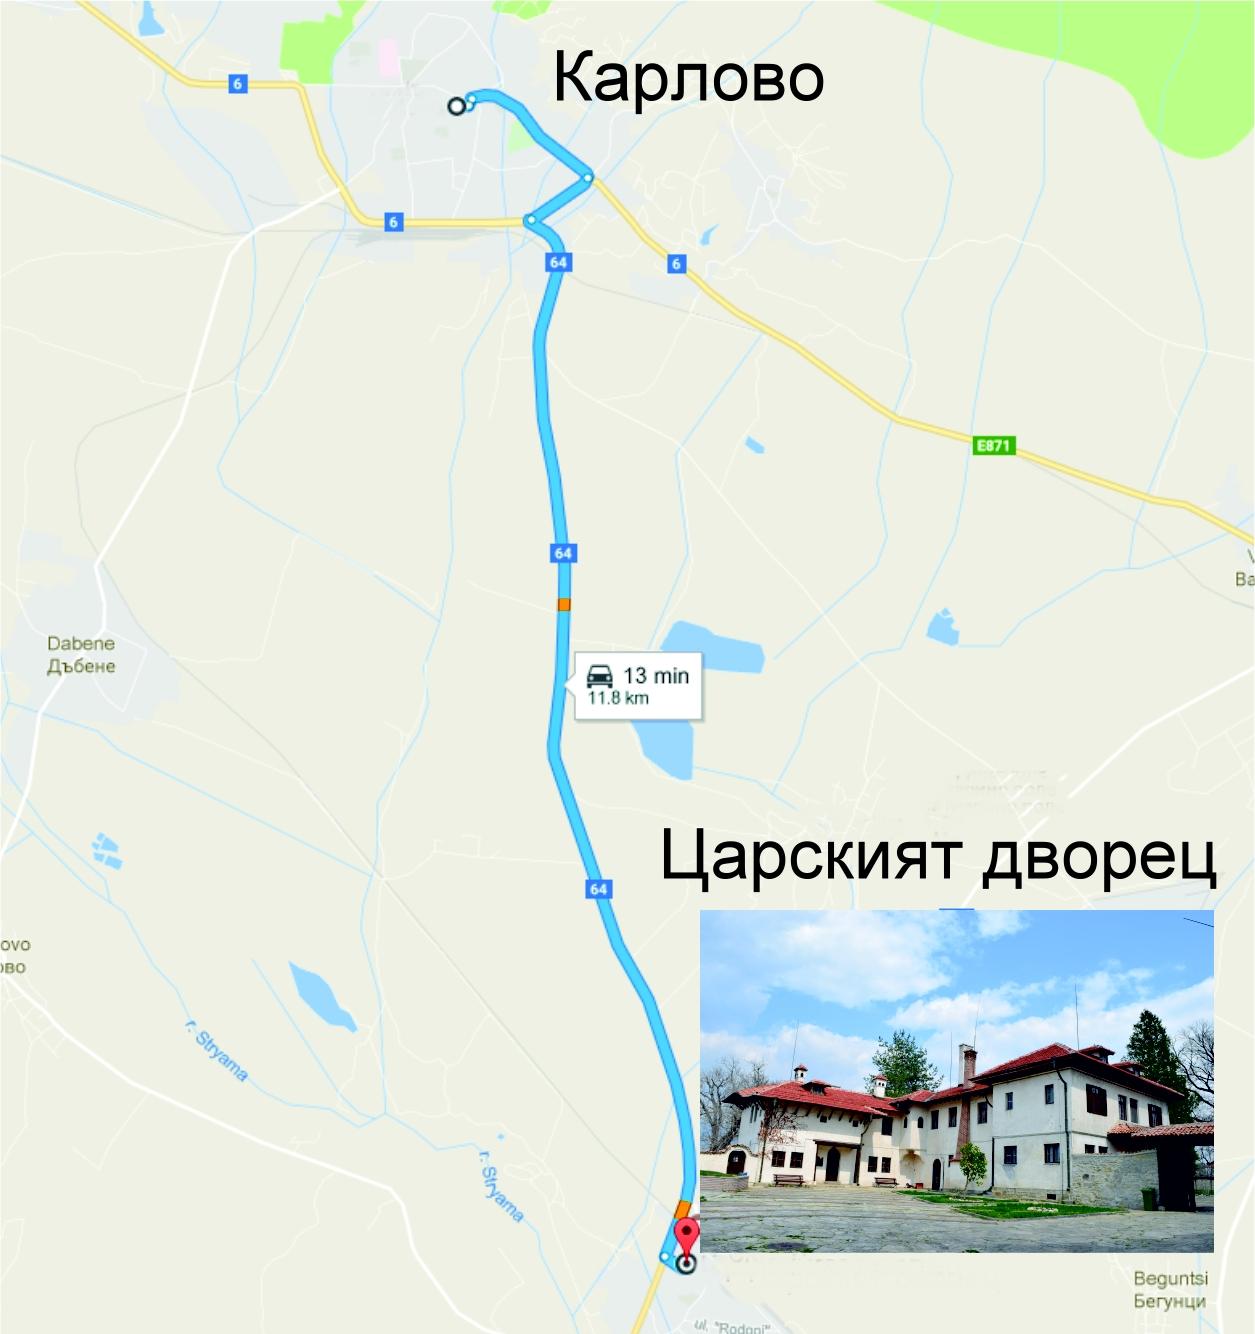 Царски дворец карта